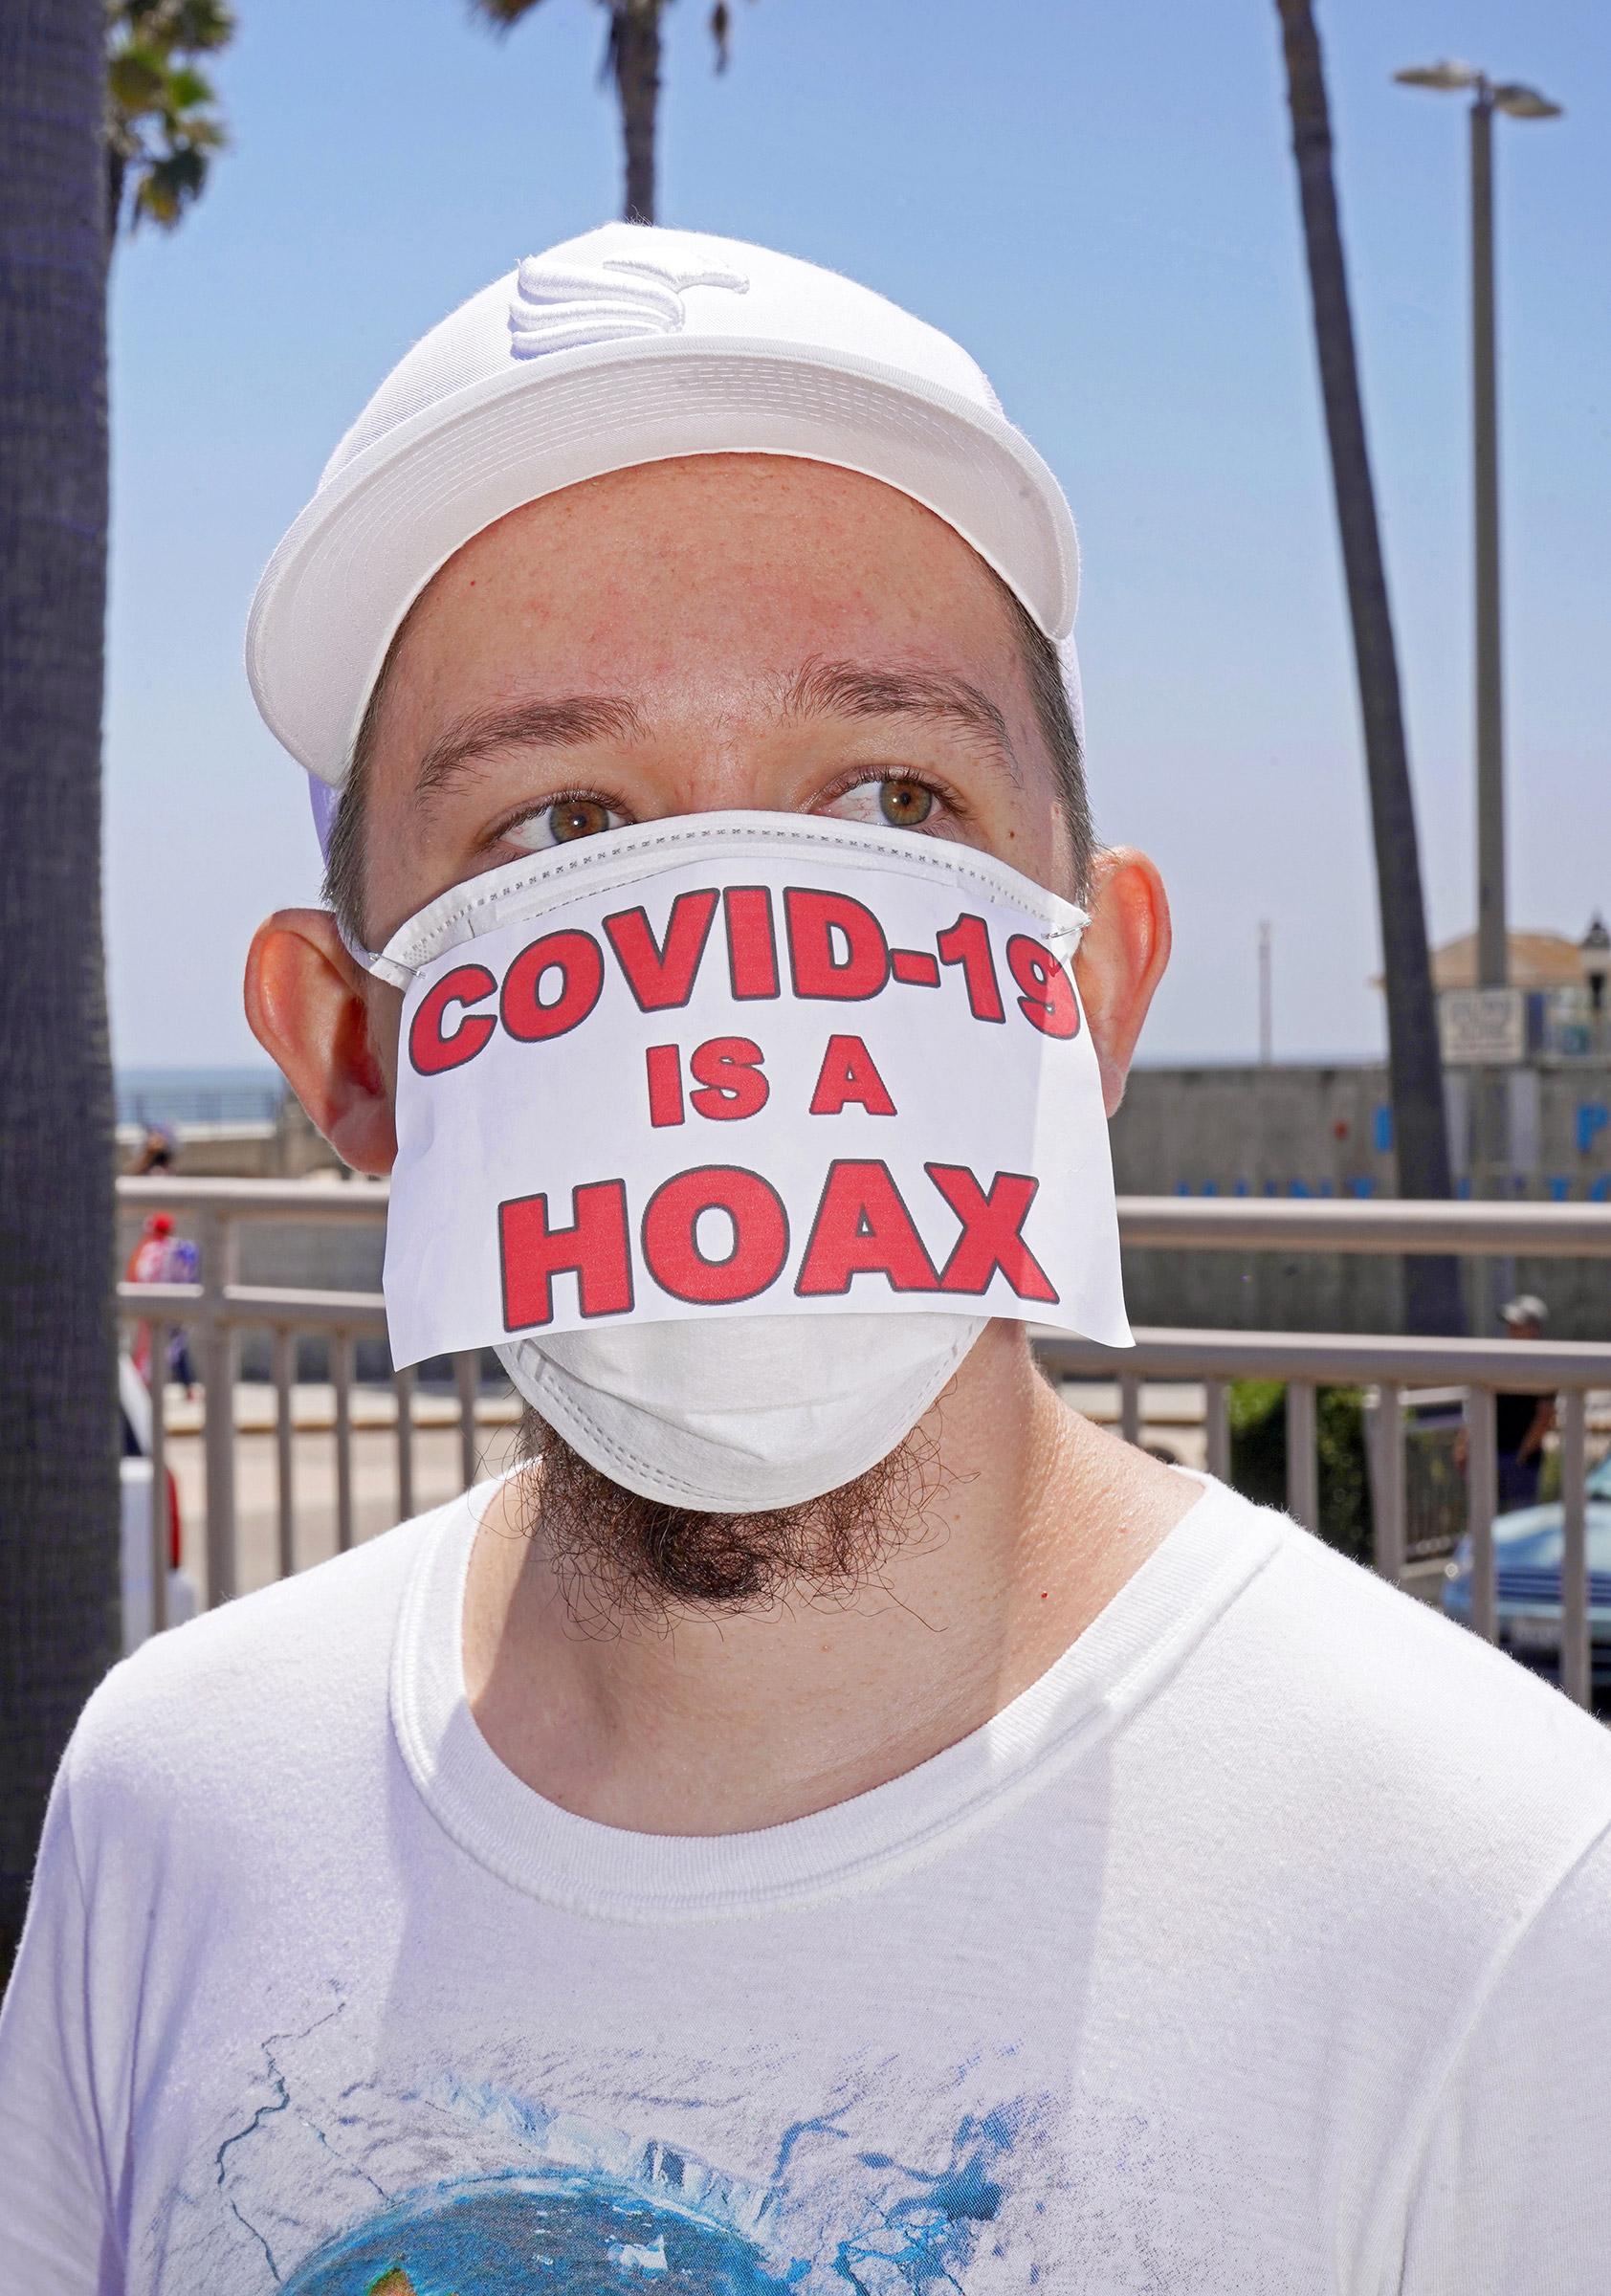 Anti-lockdown rally in Huntington Beach, Calif., May 1, 2020.